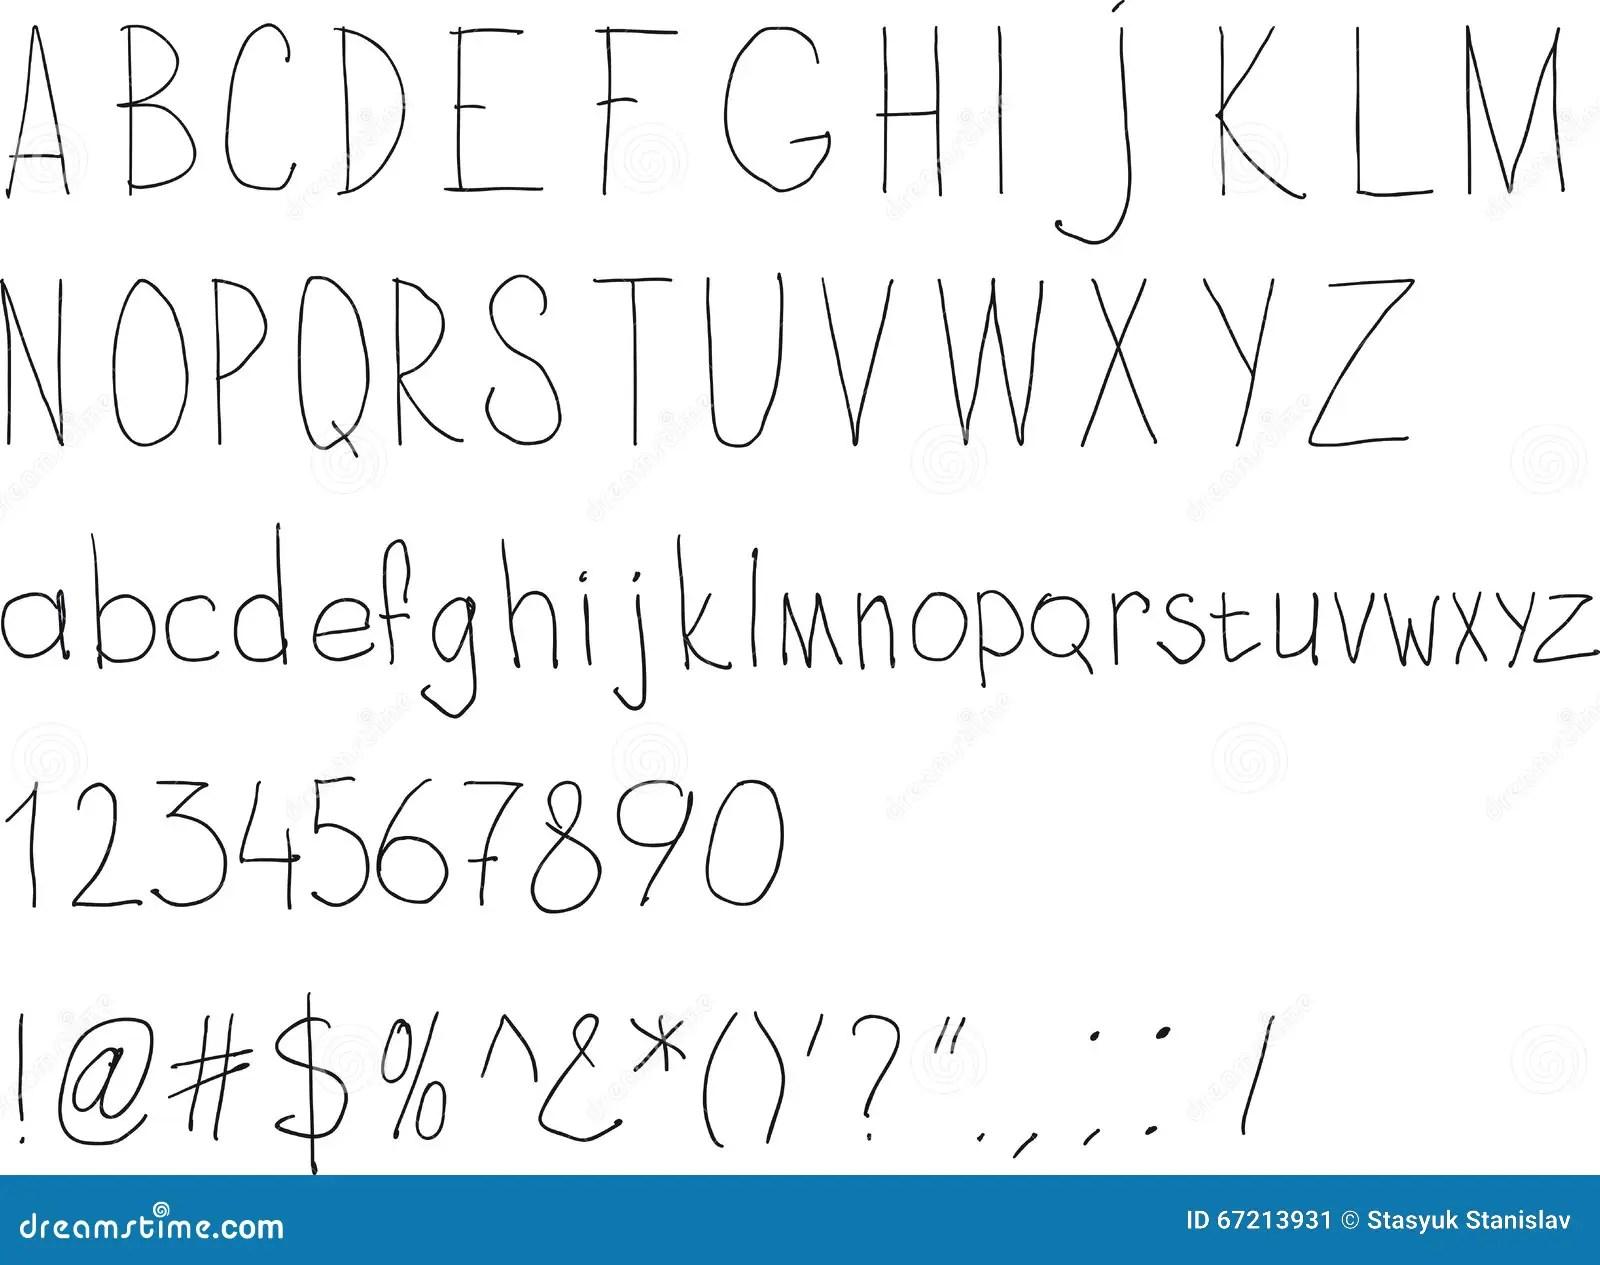 Simple Sloppy Handwriting Stock Illustrations 2 Simple Sloppy Handwriting Stock Illustrations